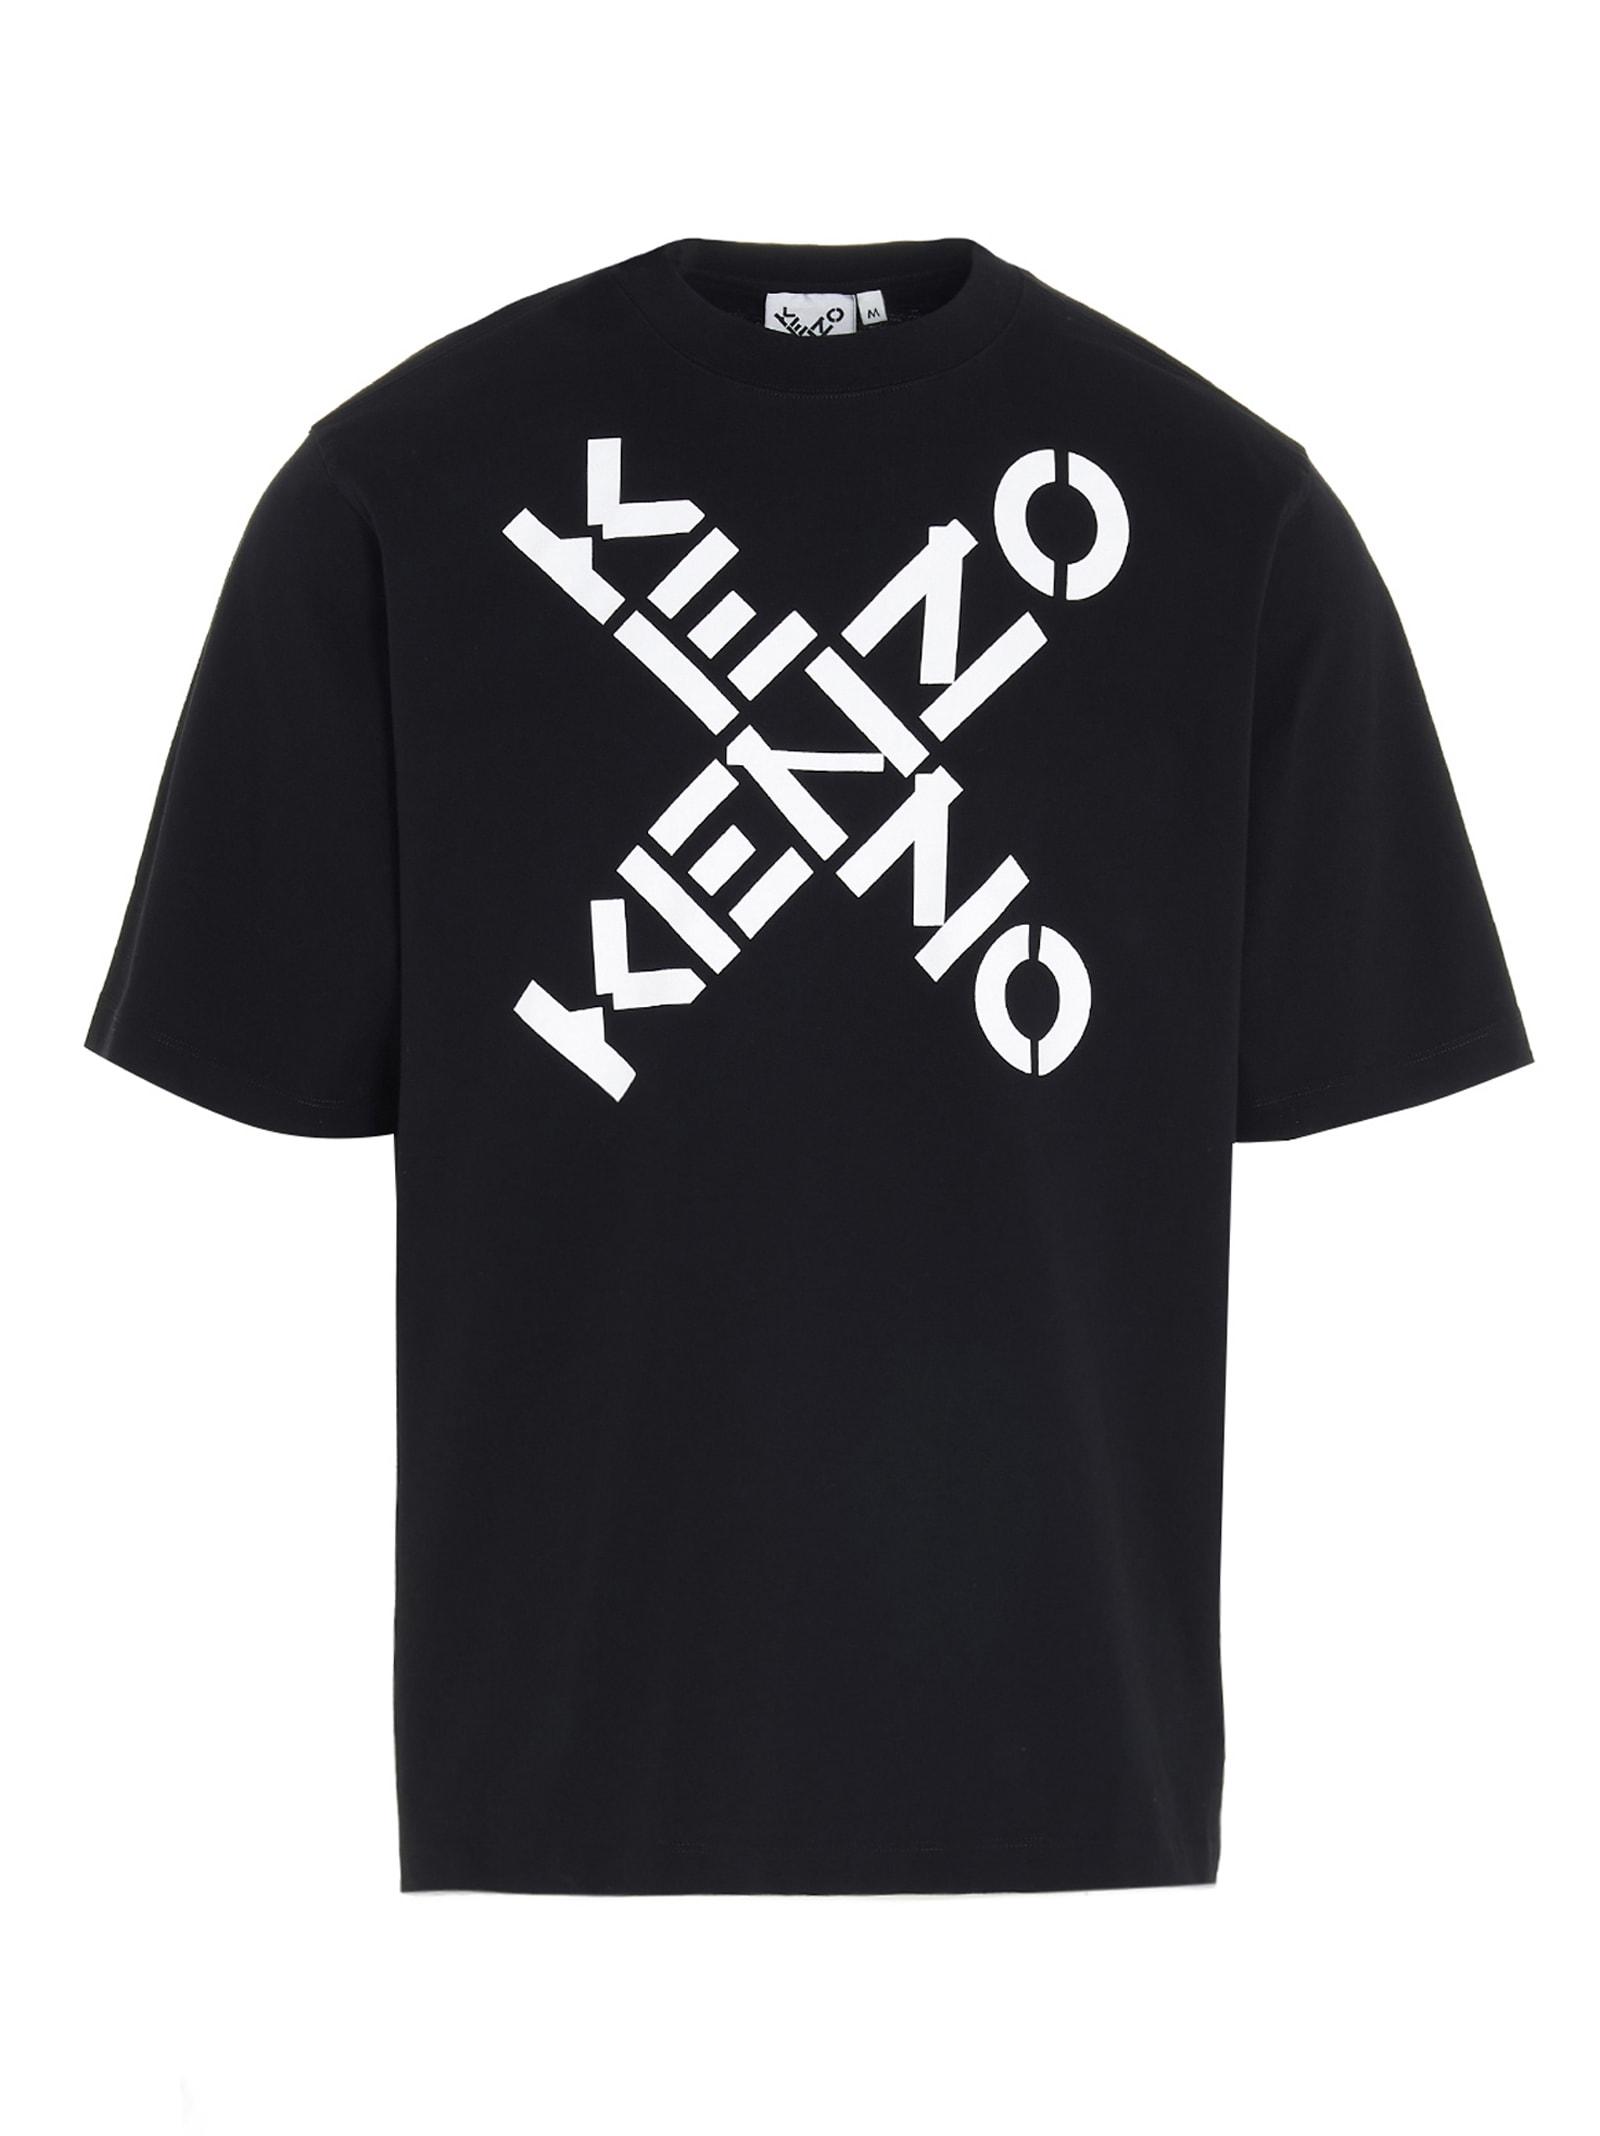 Kenzo SPORT T-SHIRT